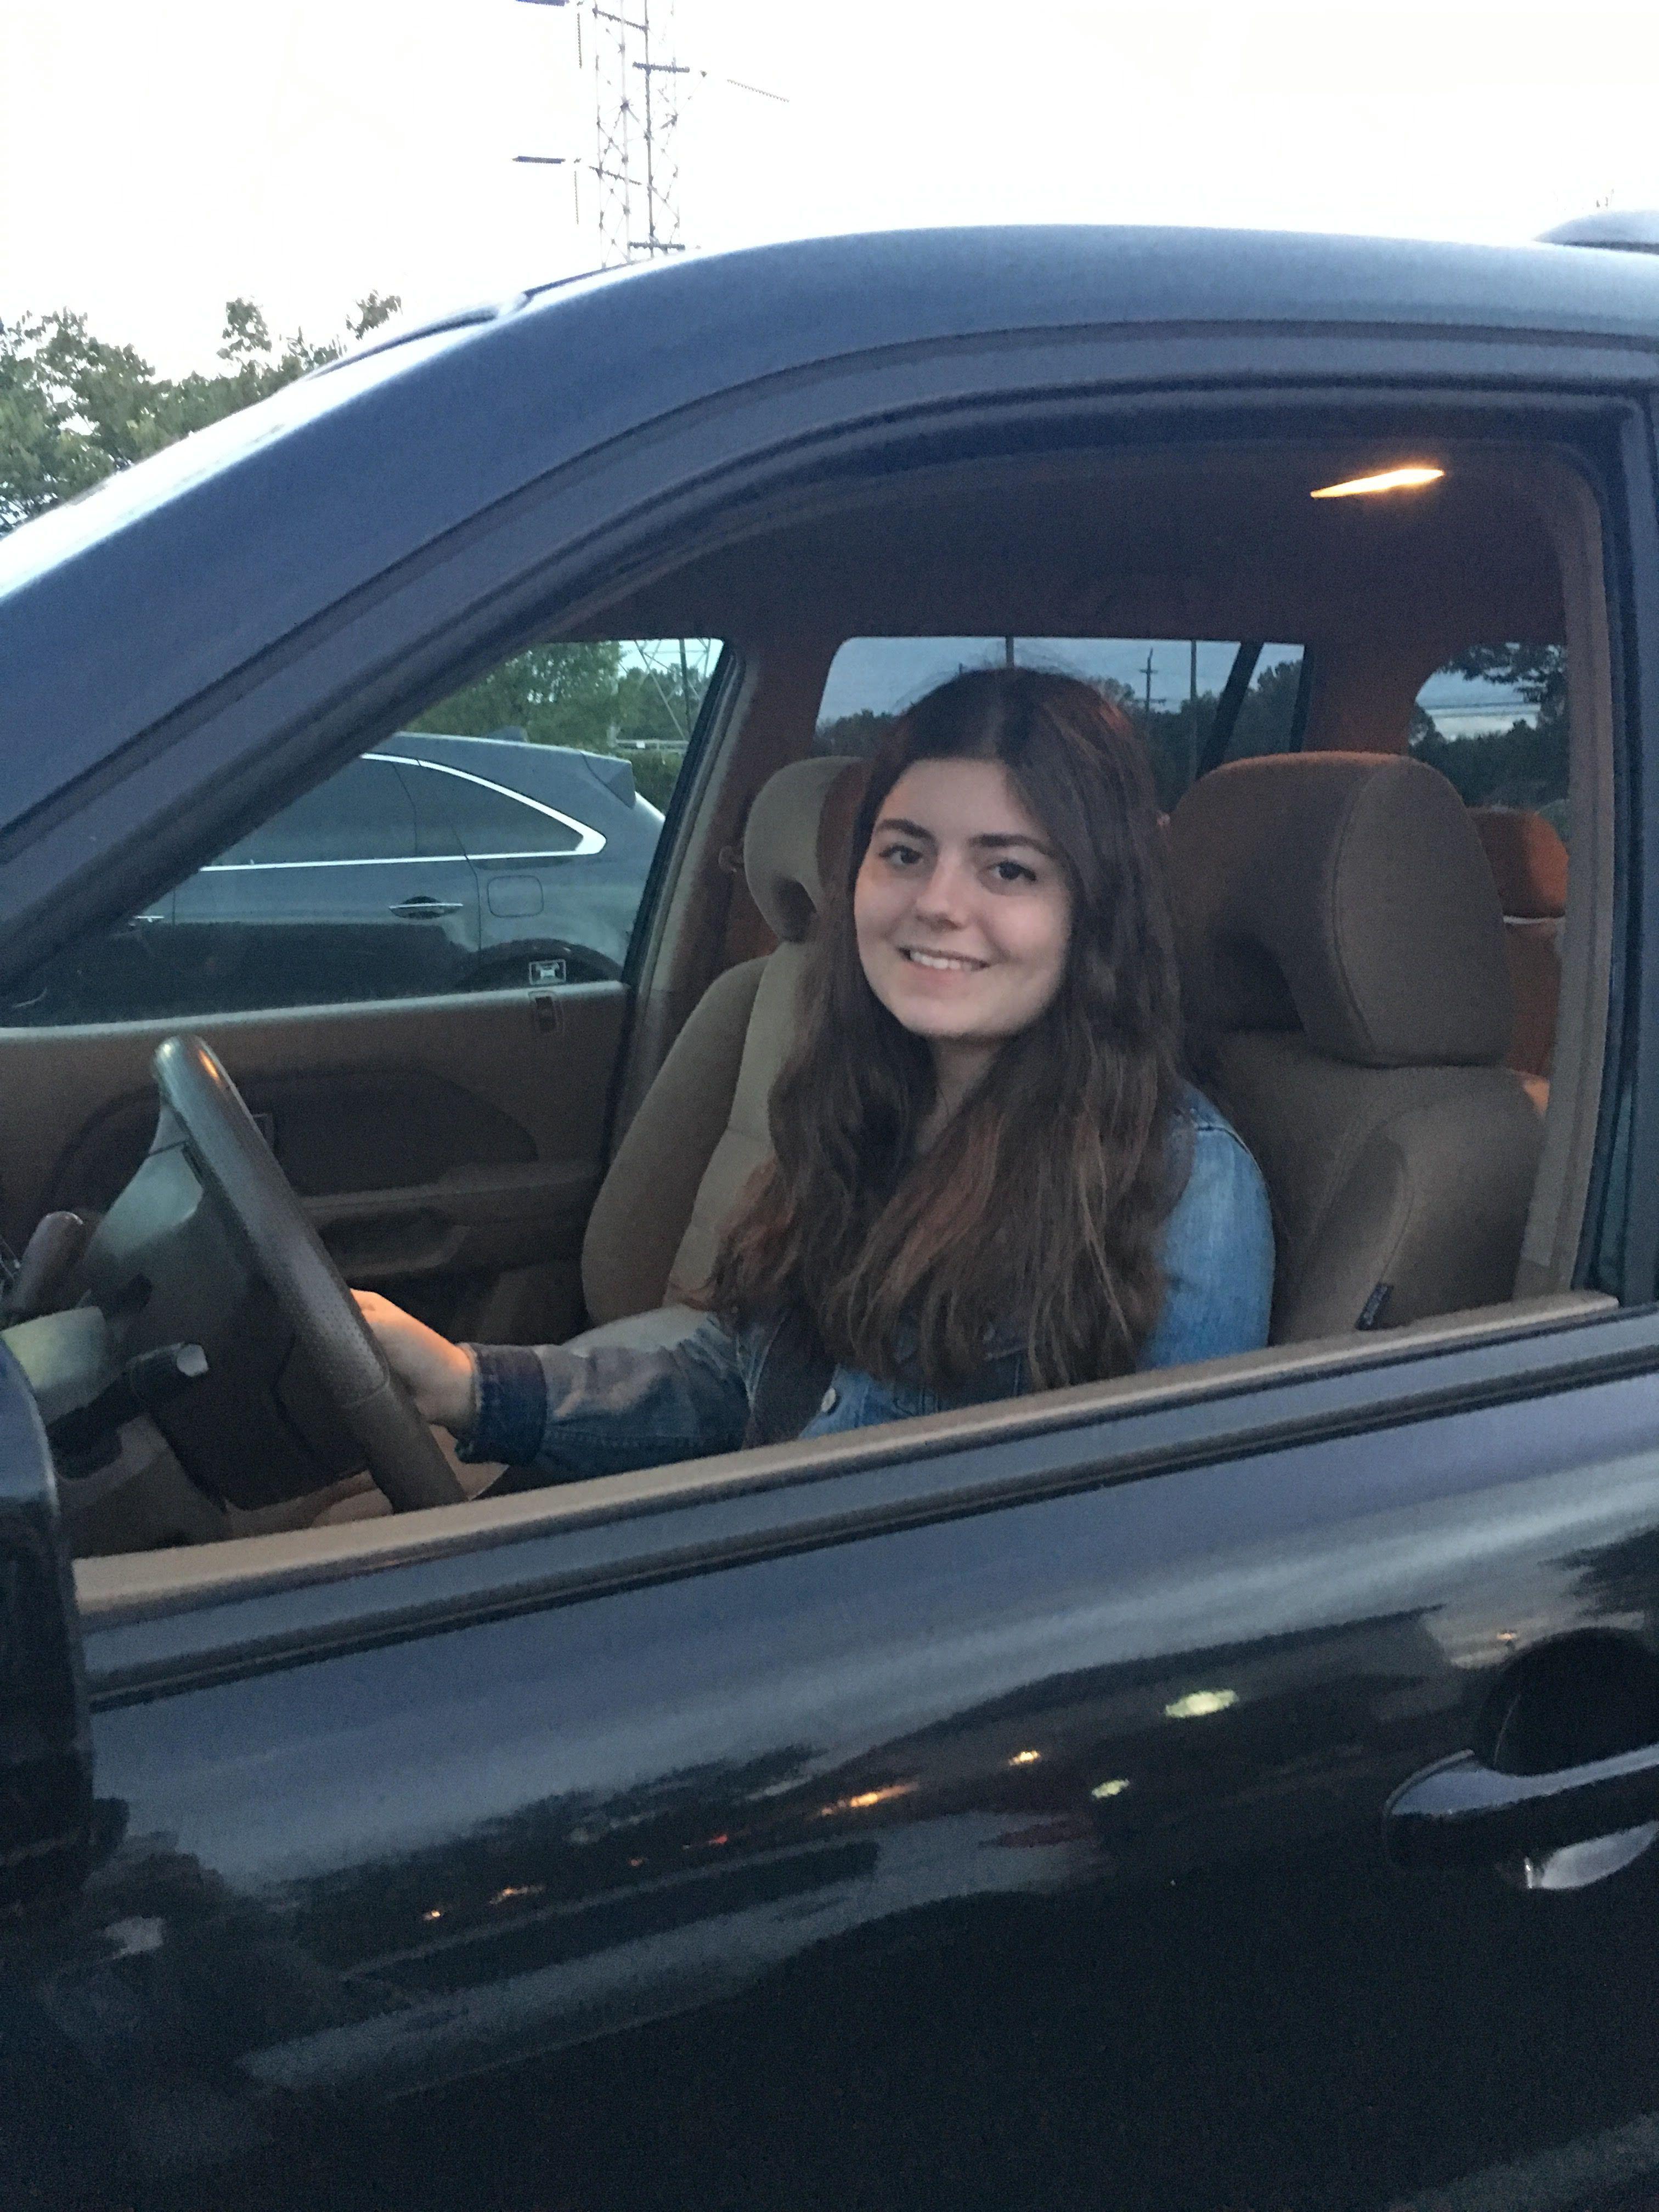 Randolph Graduate Marisa Blackman Earns Girl Scout Gold Award For Safe Driving Website, photo 1